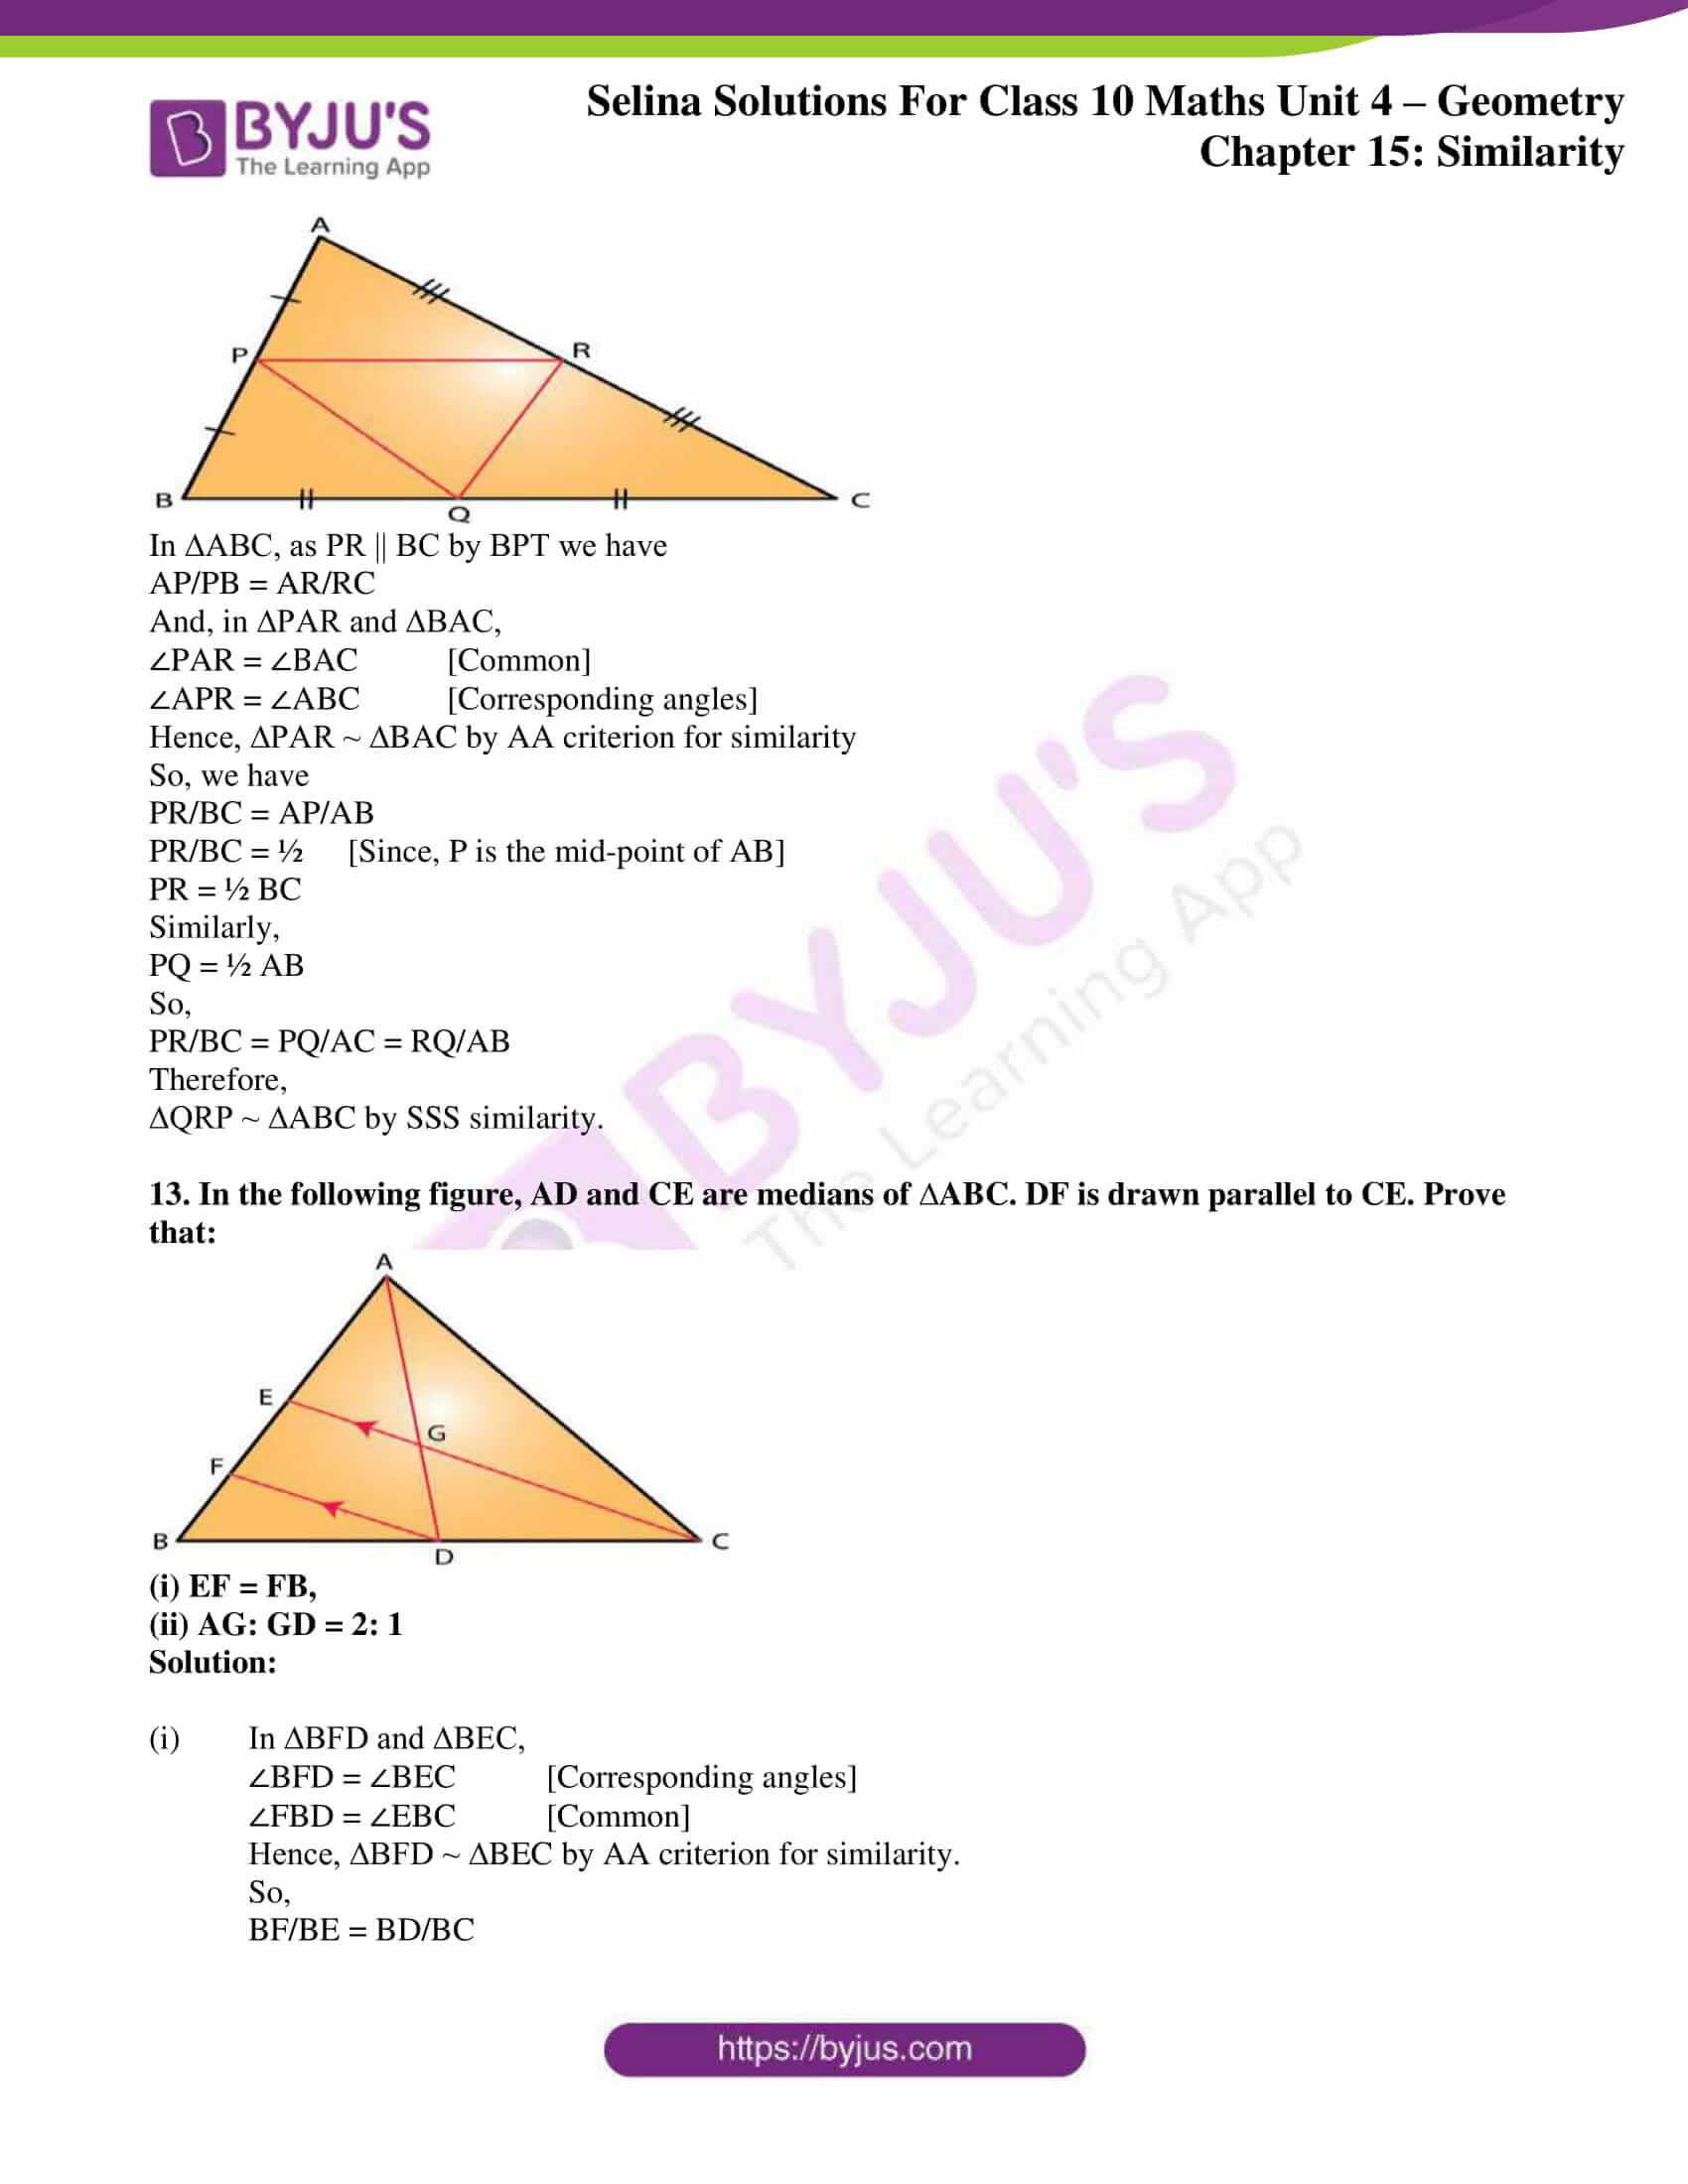 selina-sol-maths-class-10-ch-15-ex-e-8